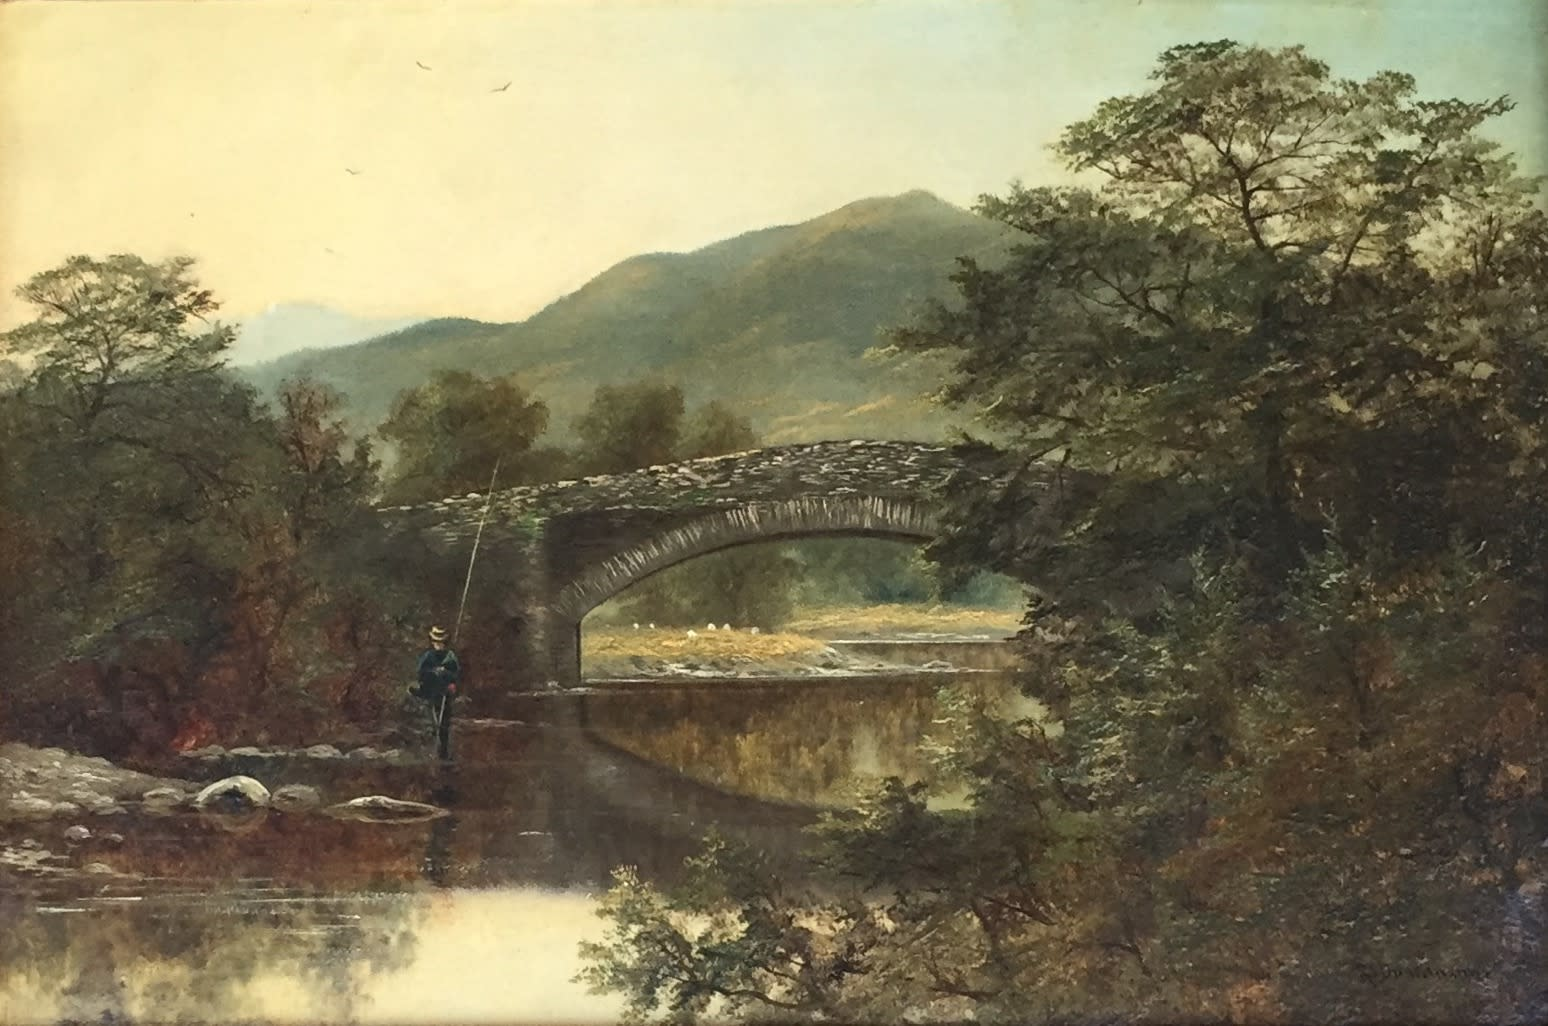 Robert Scott Duncanson, Stone Bridge, c. 1870